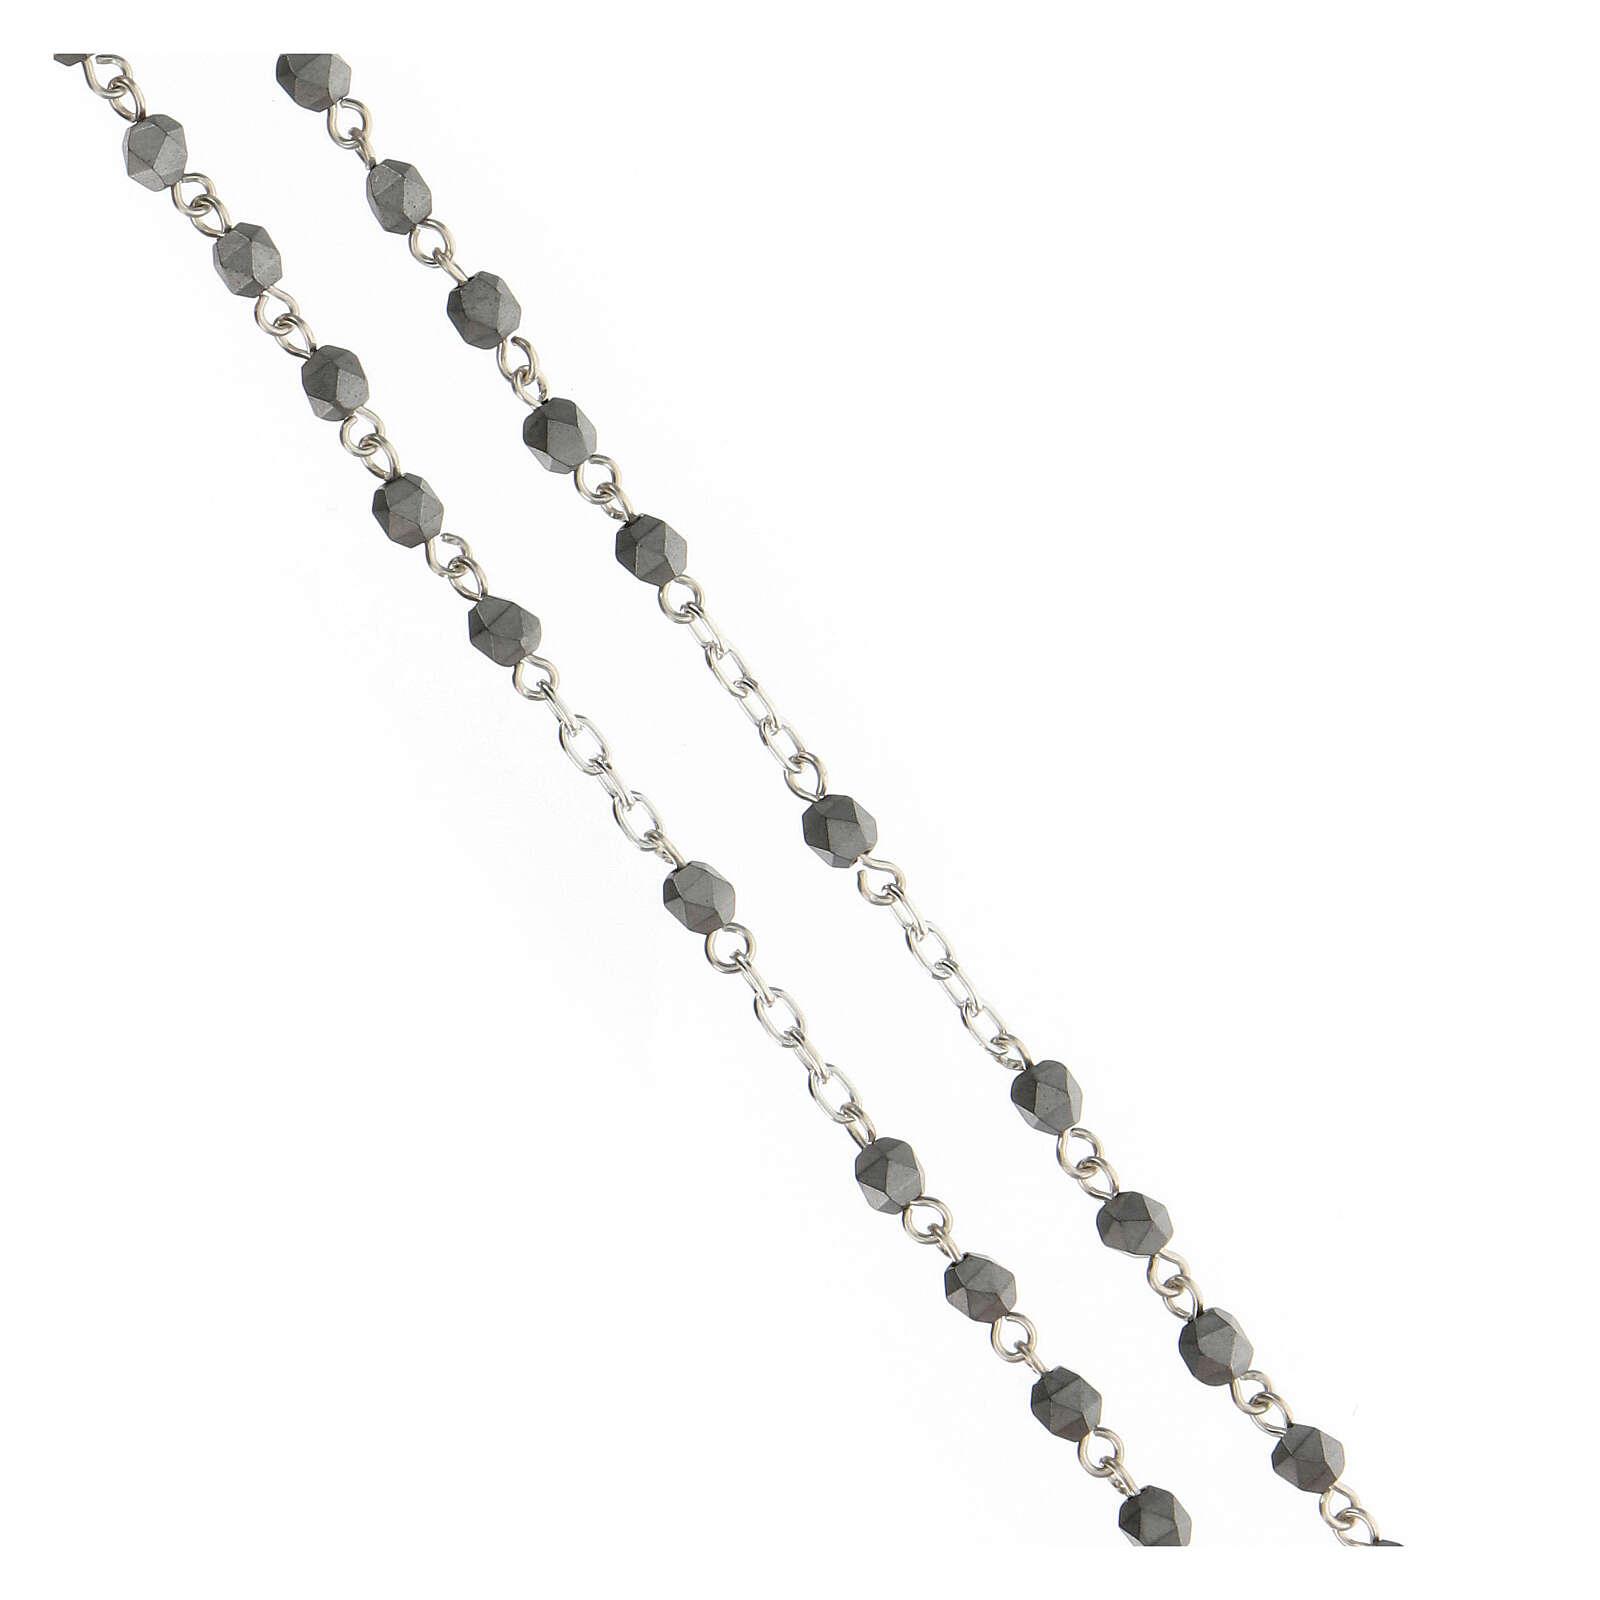 Terço prata 925 contas hematita multifacetada cinzentas 4 mm 4